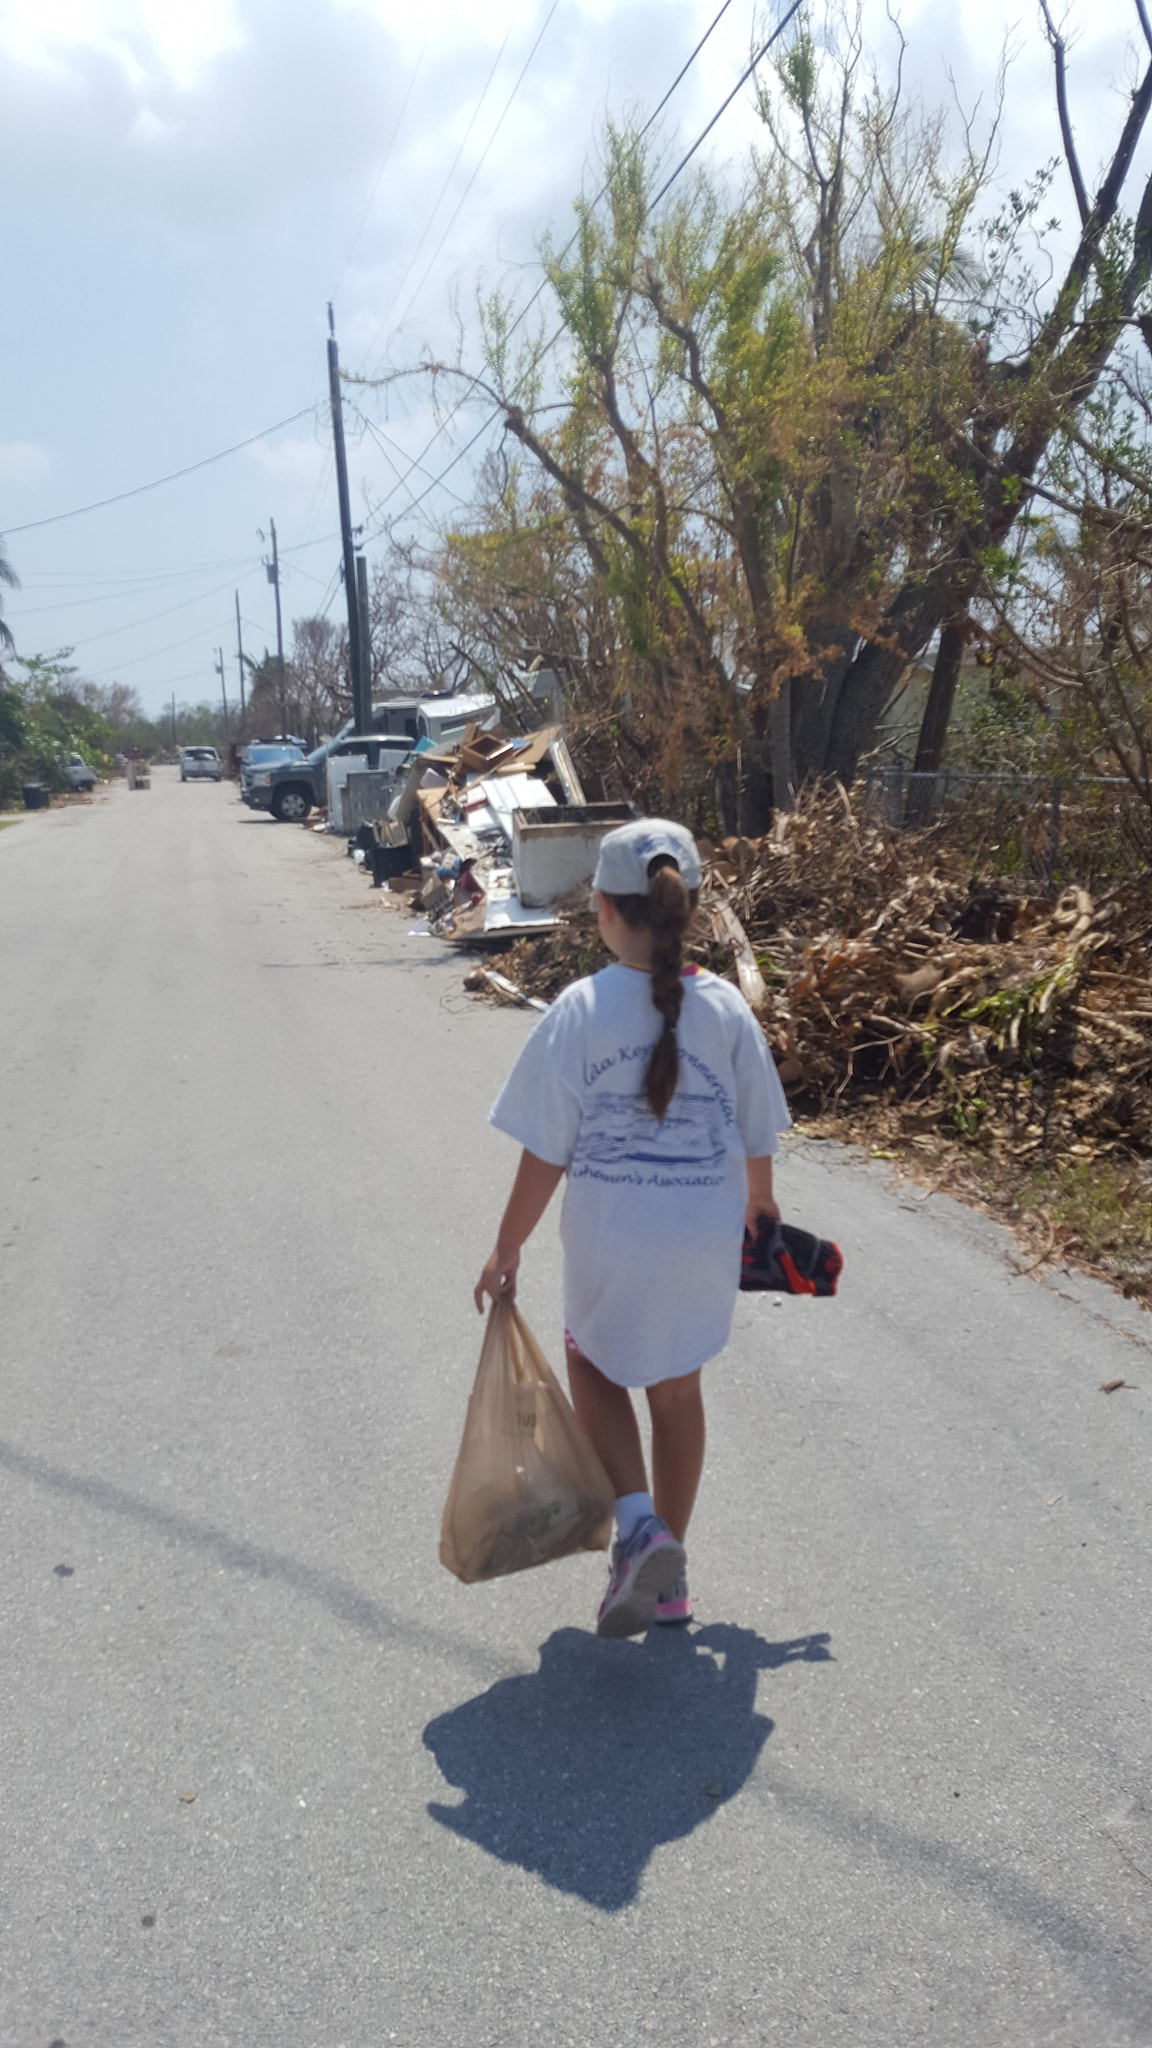 Kids-Of-The-Florida-Keys-Post-Hurricane-Cleanup-Efforts.jpg